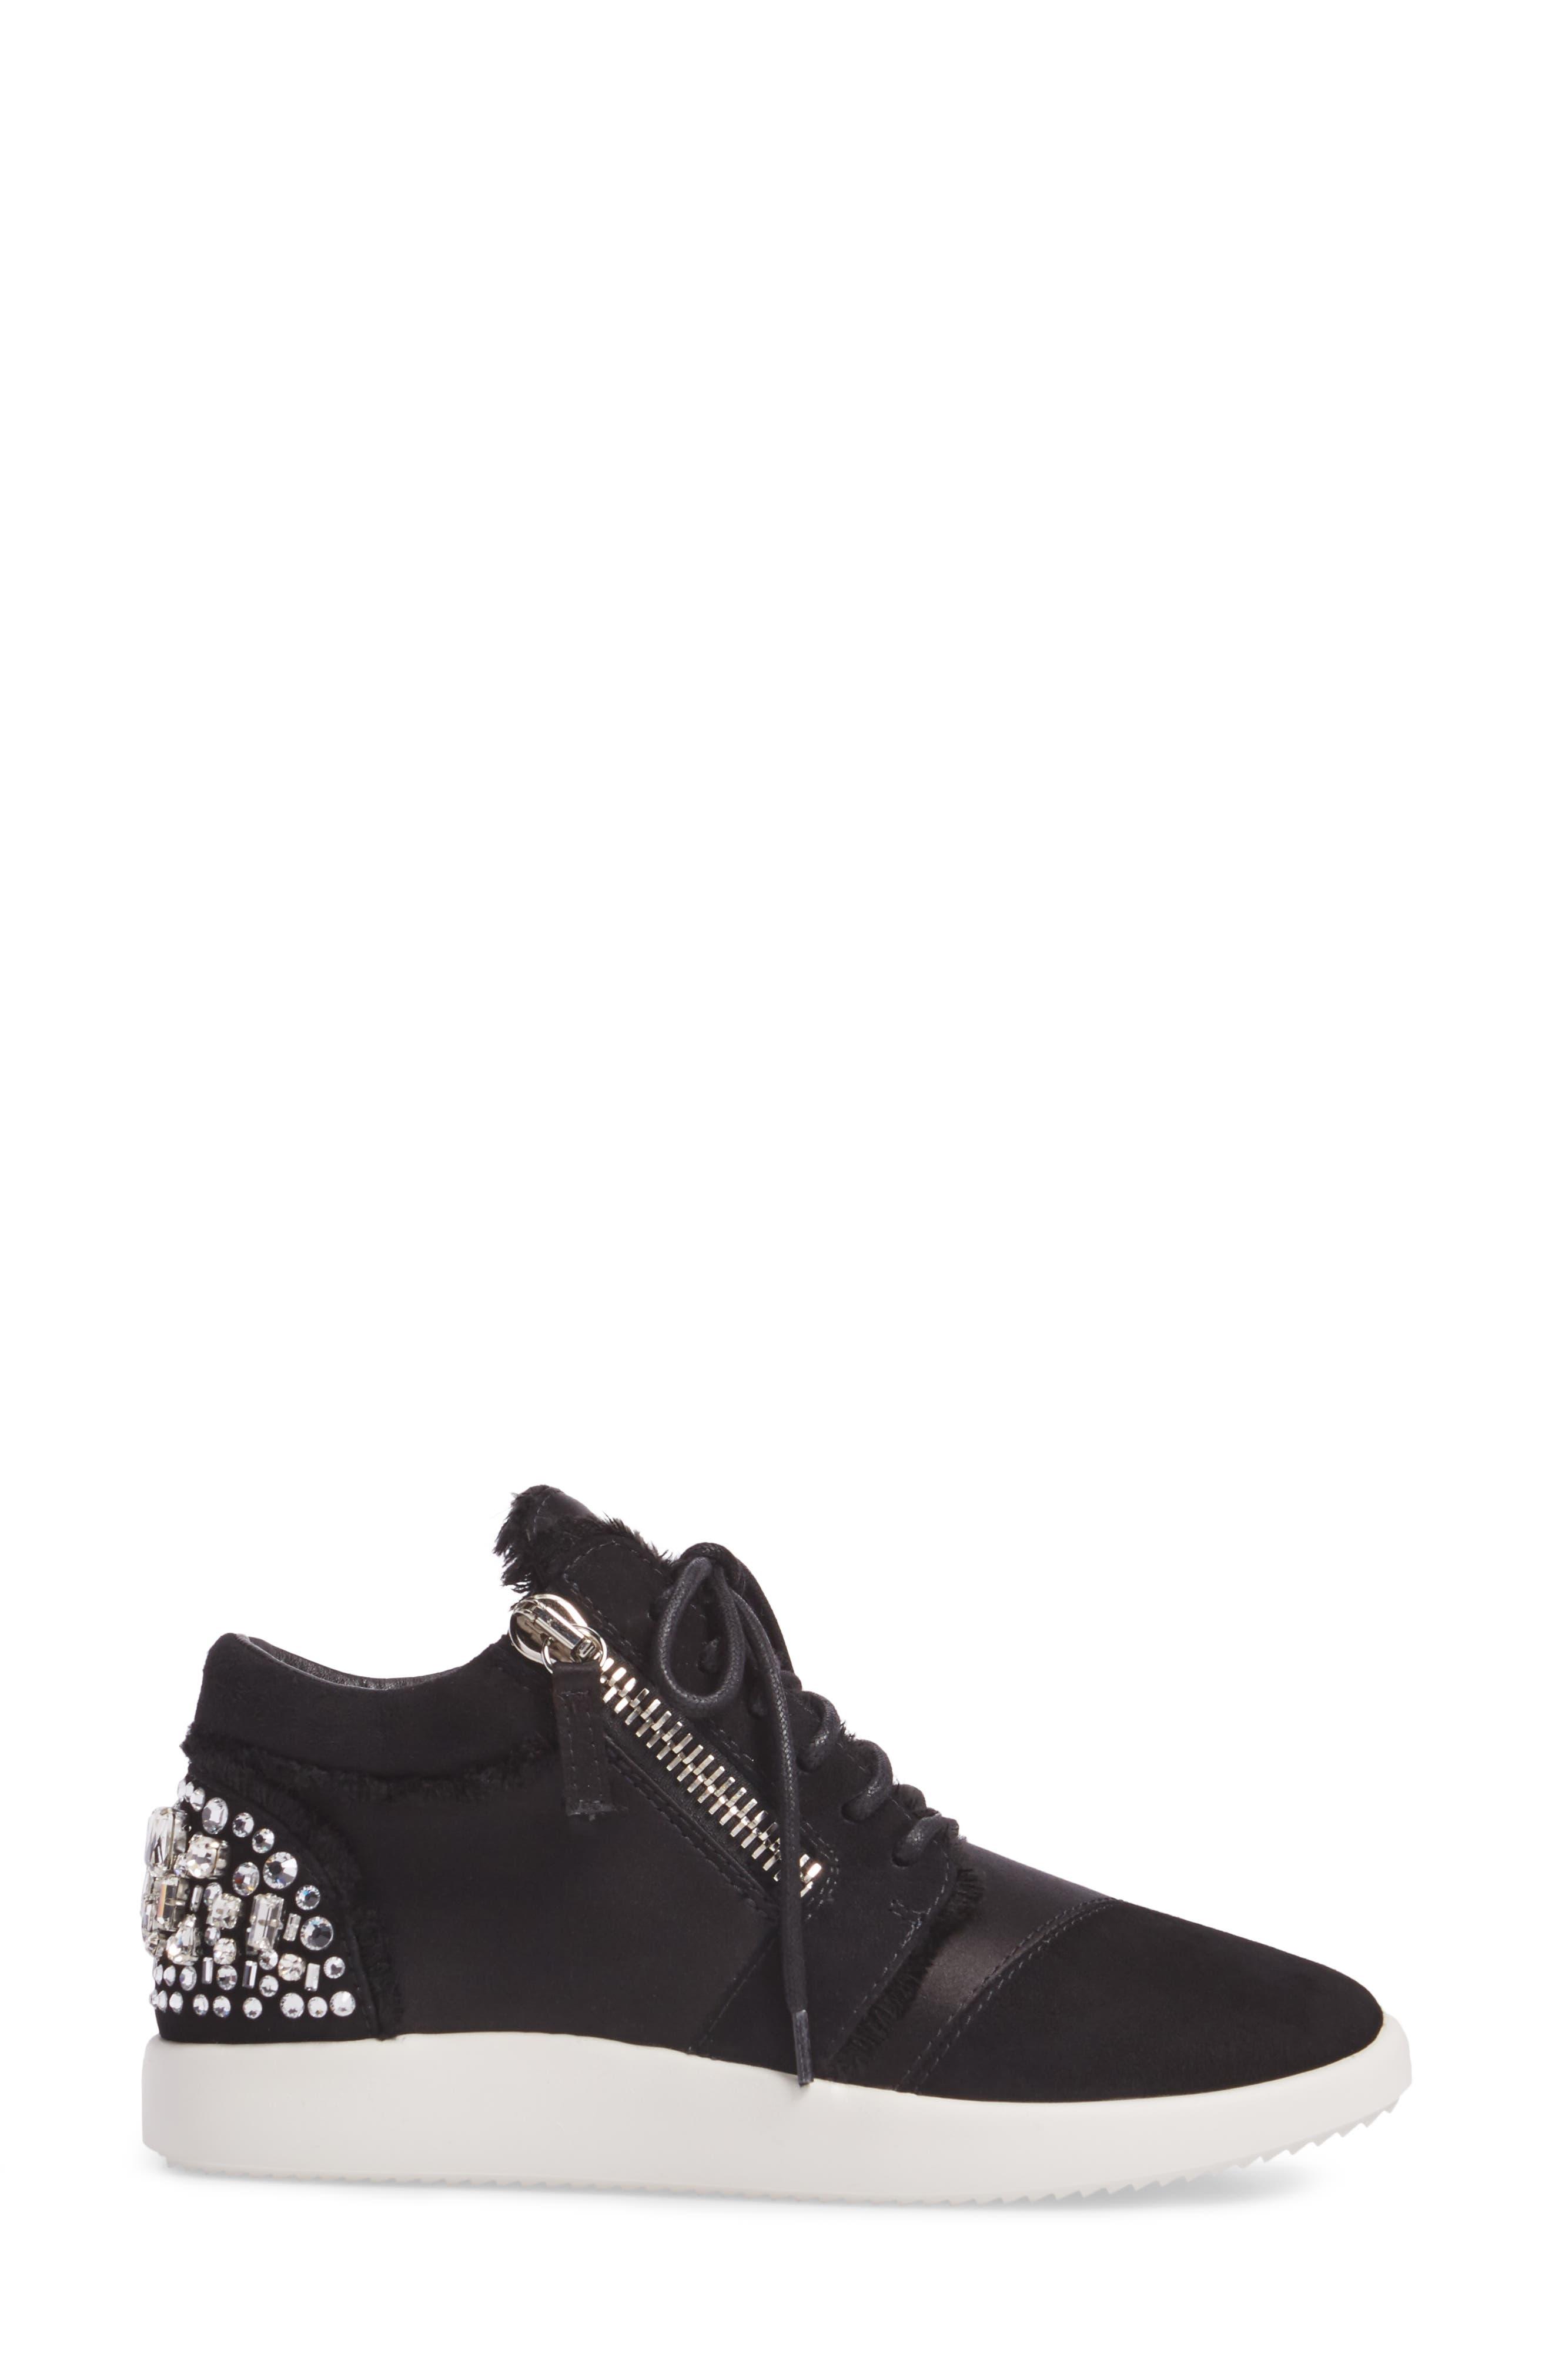 GIUSEPPE ZANOTTI,                             Swarovski Crystal Embellished Sneaker,                             Alternate thumbnail 3, color,                             001